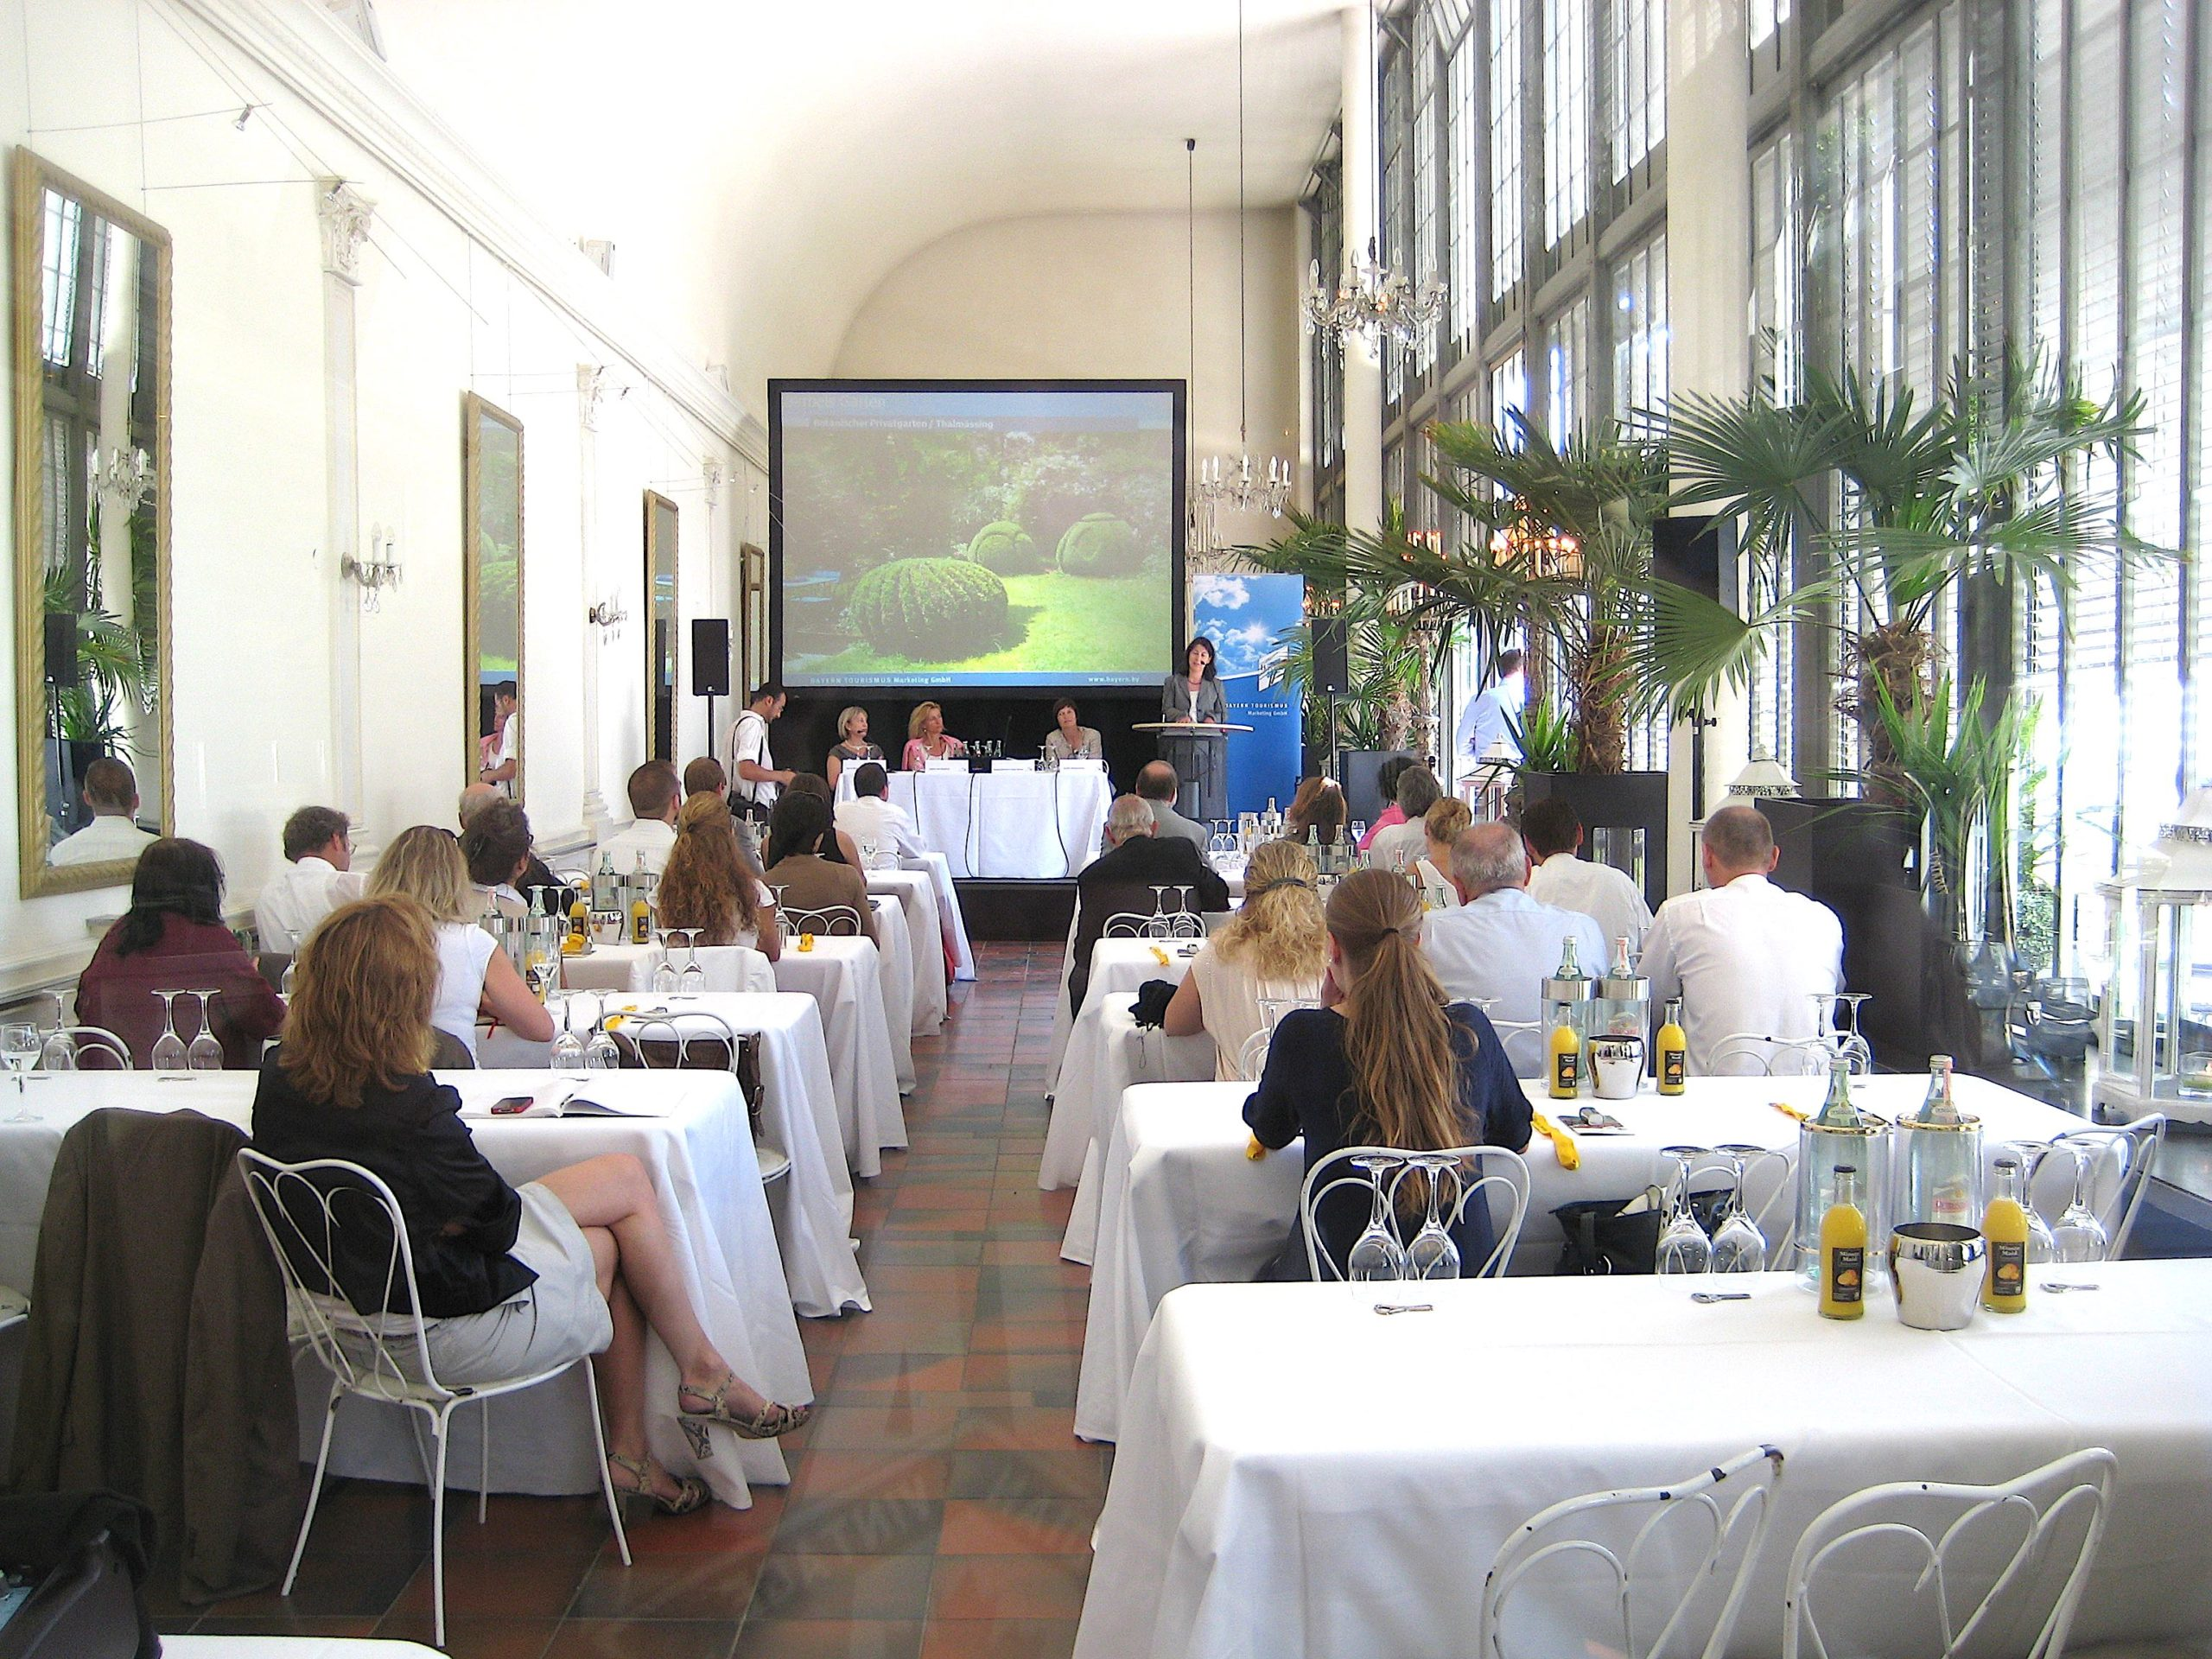 Tagung, Schlosscafé im Palmenhaus